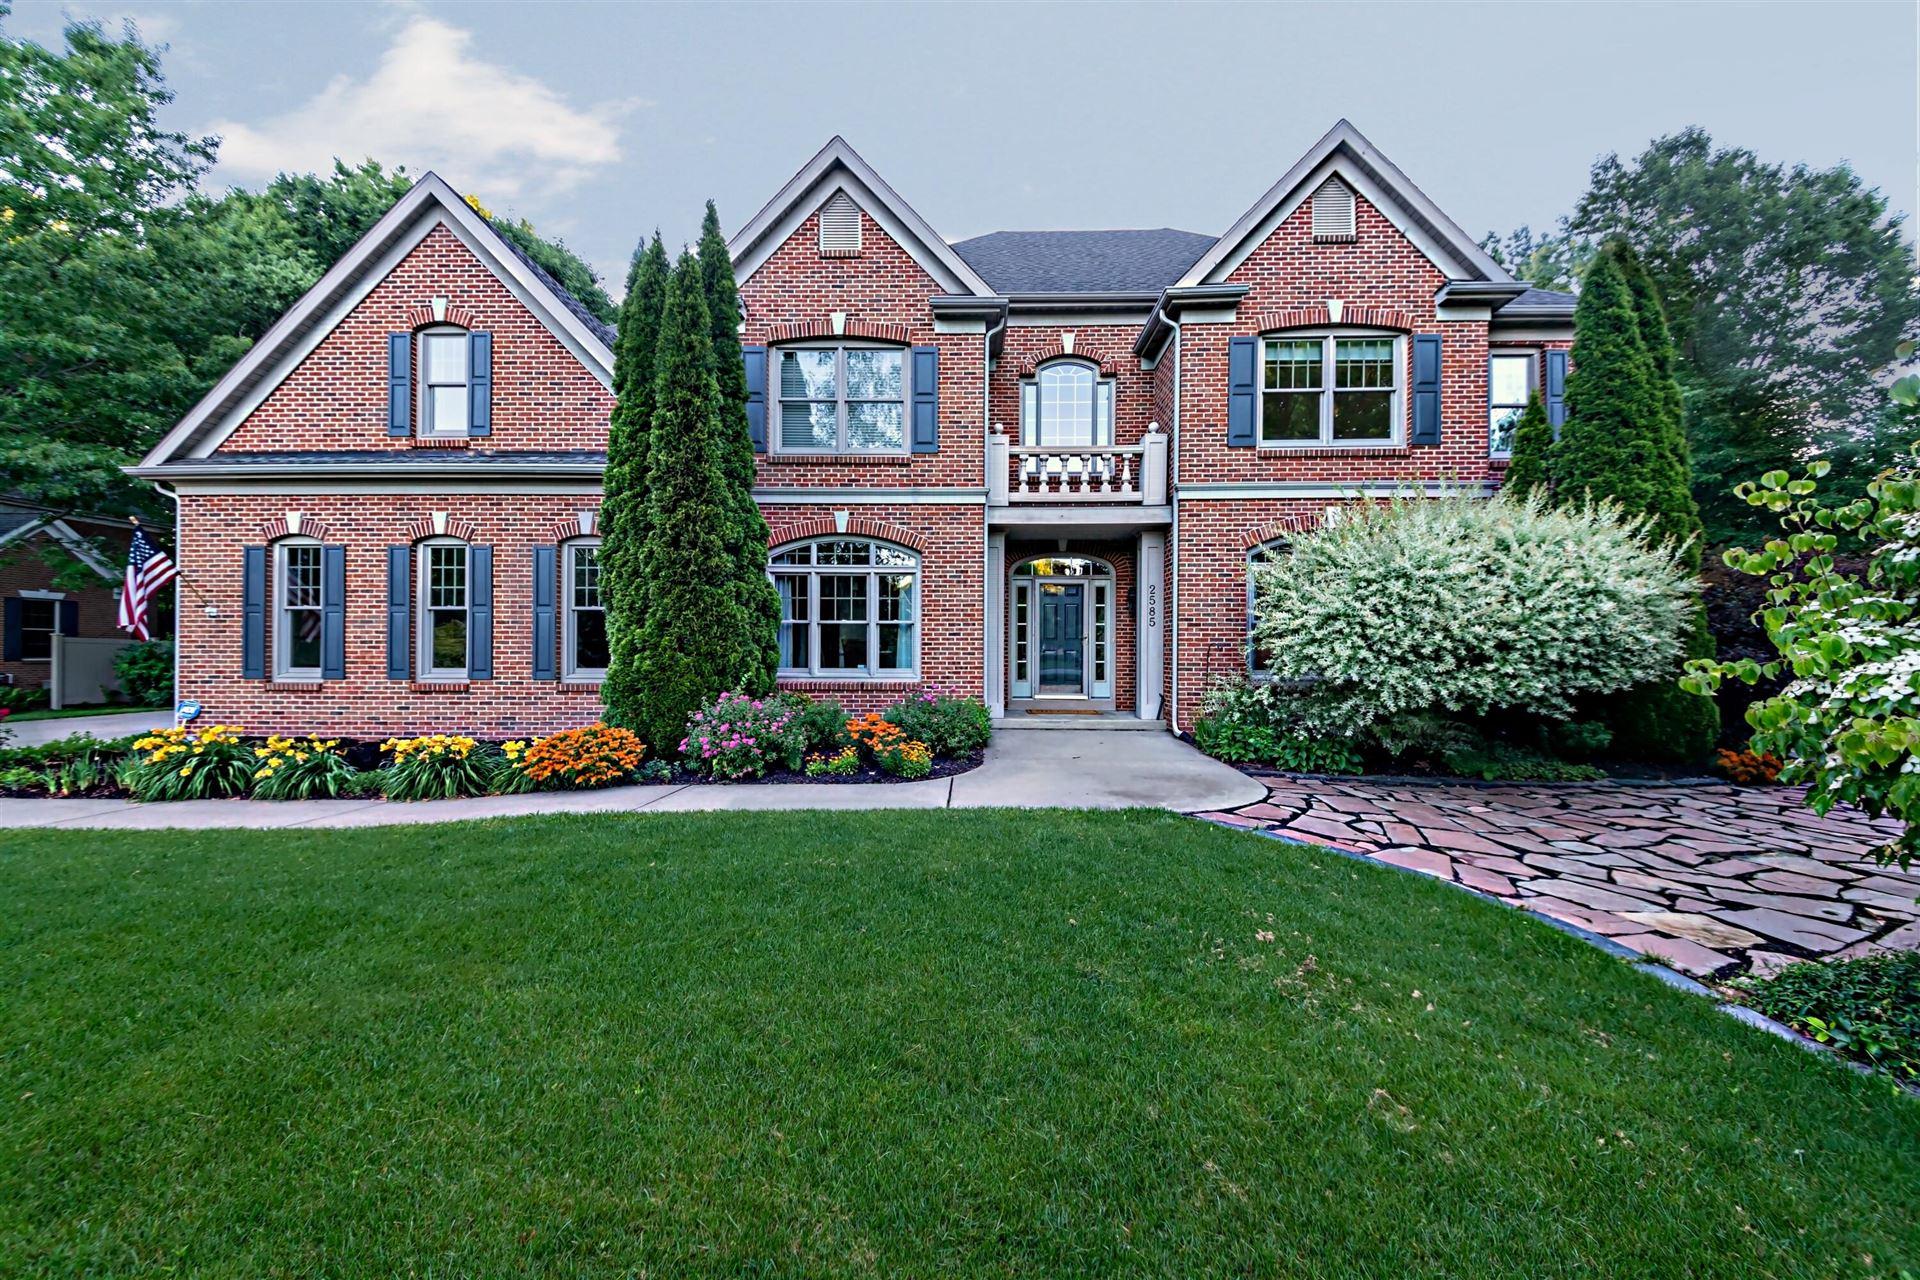 2585 Heritage Way, Stevensville, MI 49127 - MLS#: 21023422